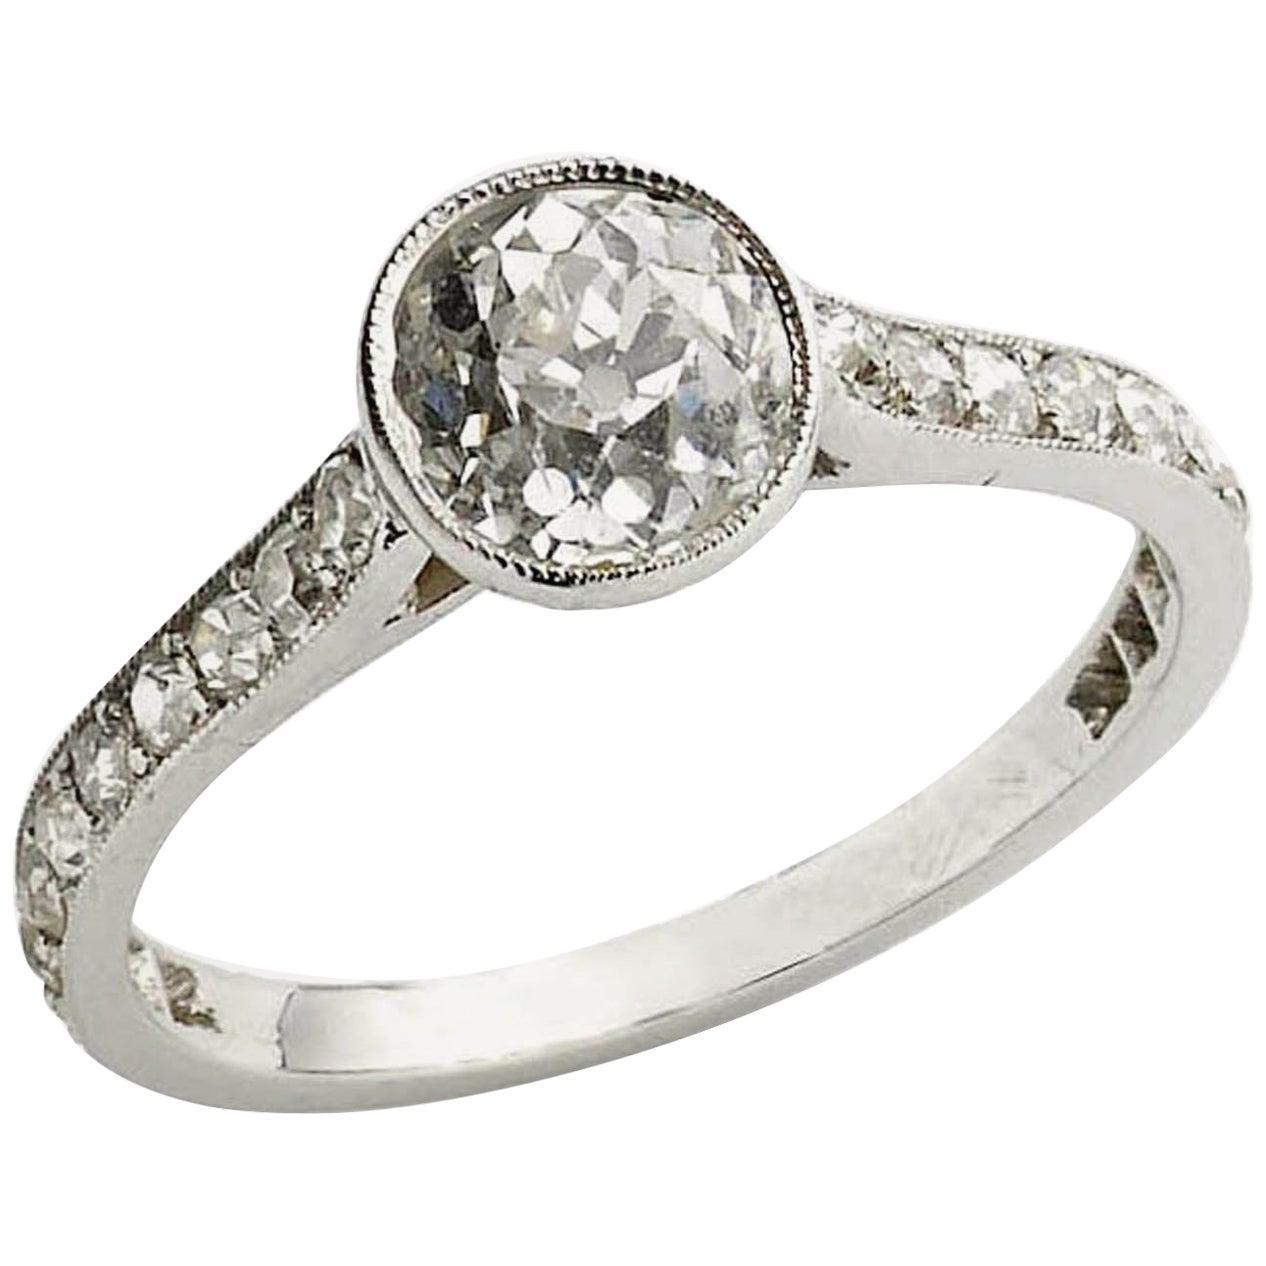 Cushion Cut Diamond Ring, 1.20 Carat